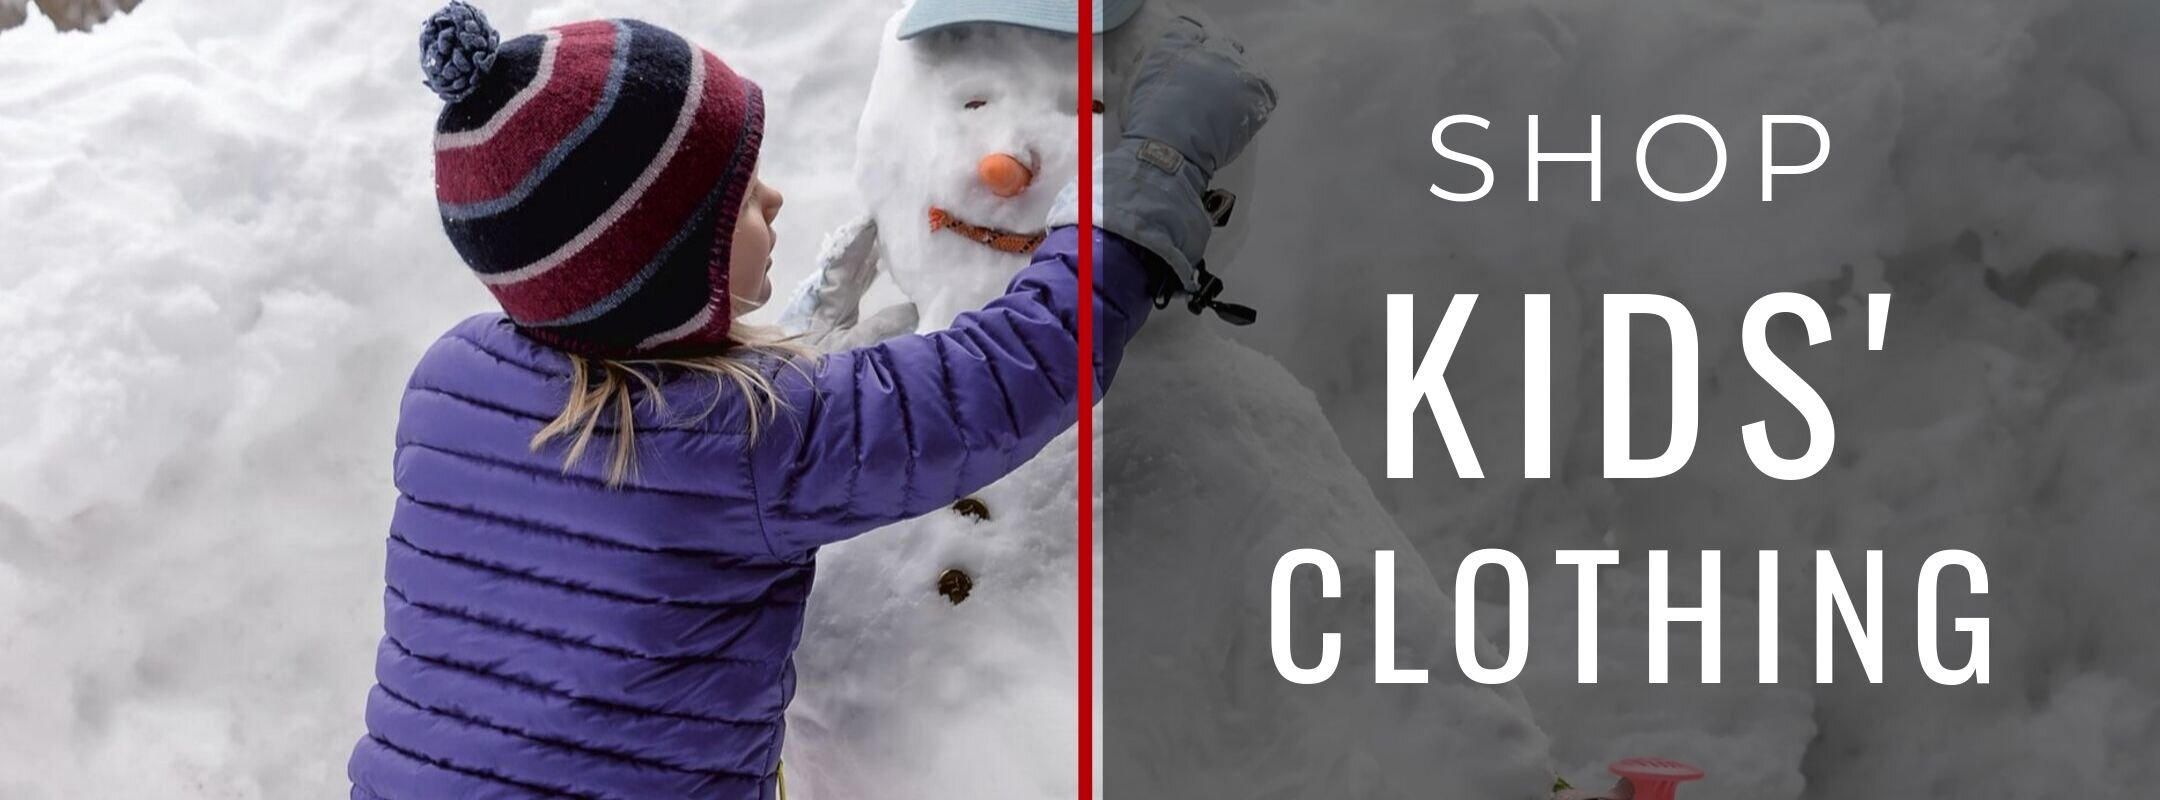 SHOP KIDS' CLOTHING